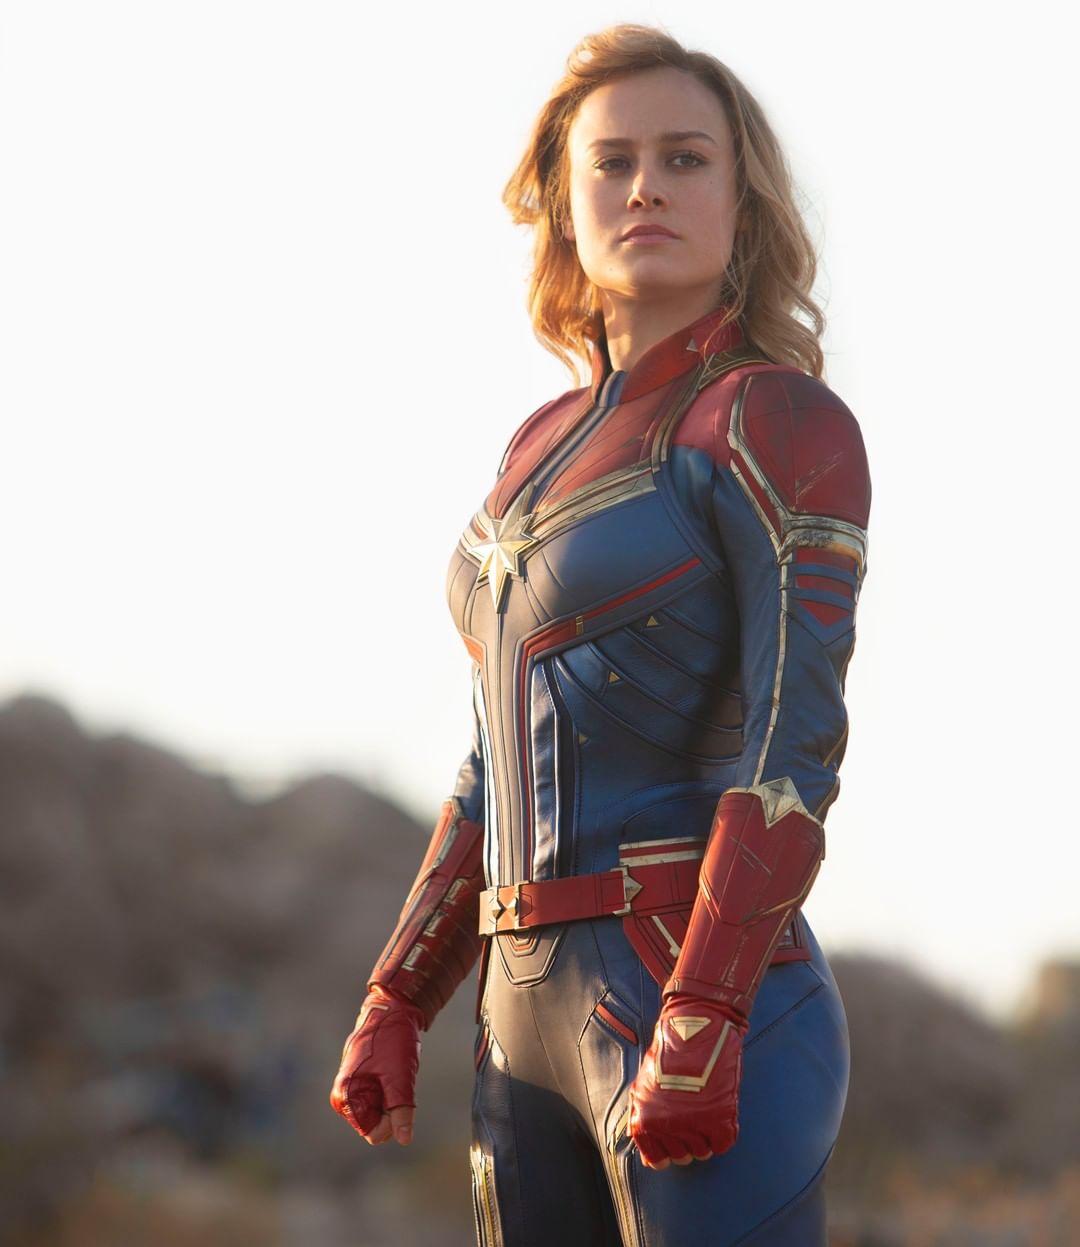 《Marvel隊長2》安排於2022年7月8日上映。